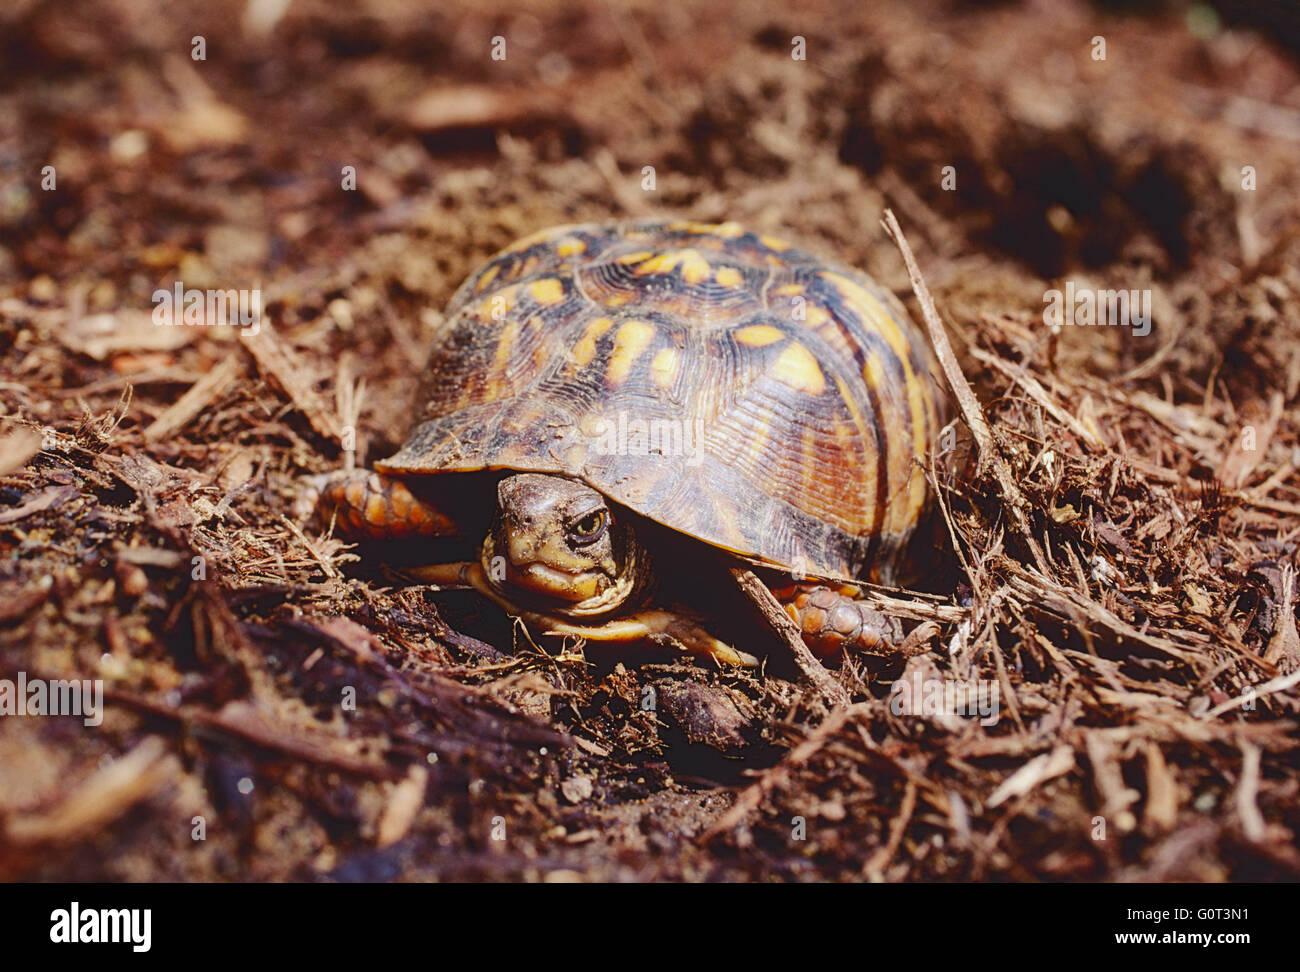 Female box turtle digging nest; laying eggs; SE Pennsylvania; USA - Stock Image